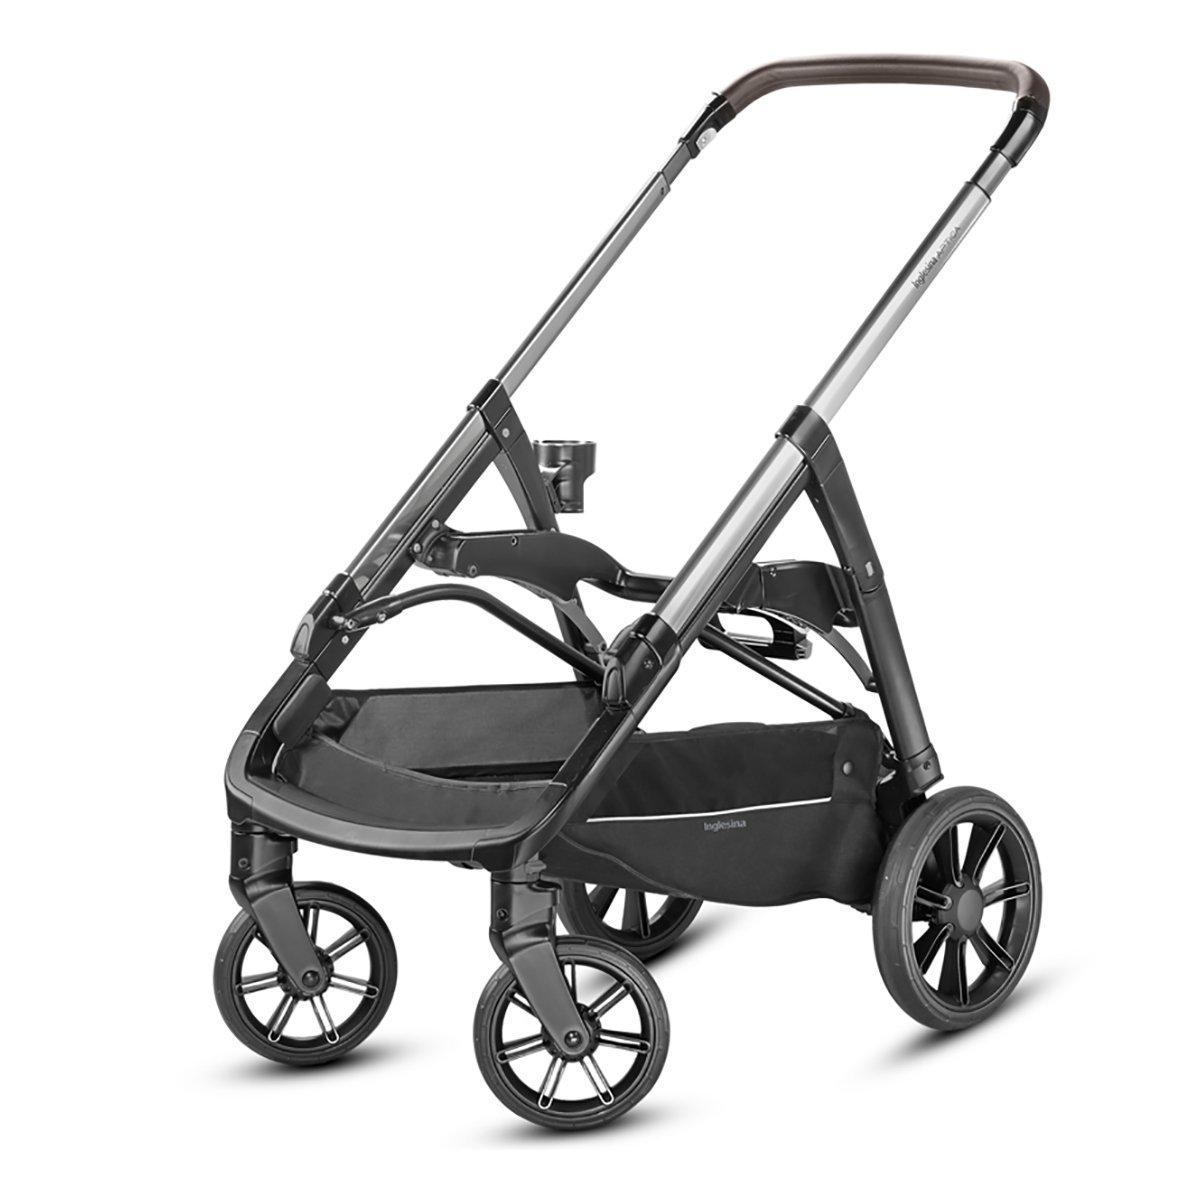 Купить Аксессуары для колясок, Шасси для коляски Inglesina Aptica Black Coffee AE70K0001 ТМ: Inglesina, серый